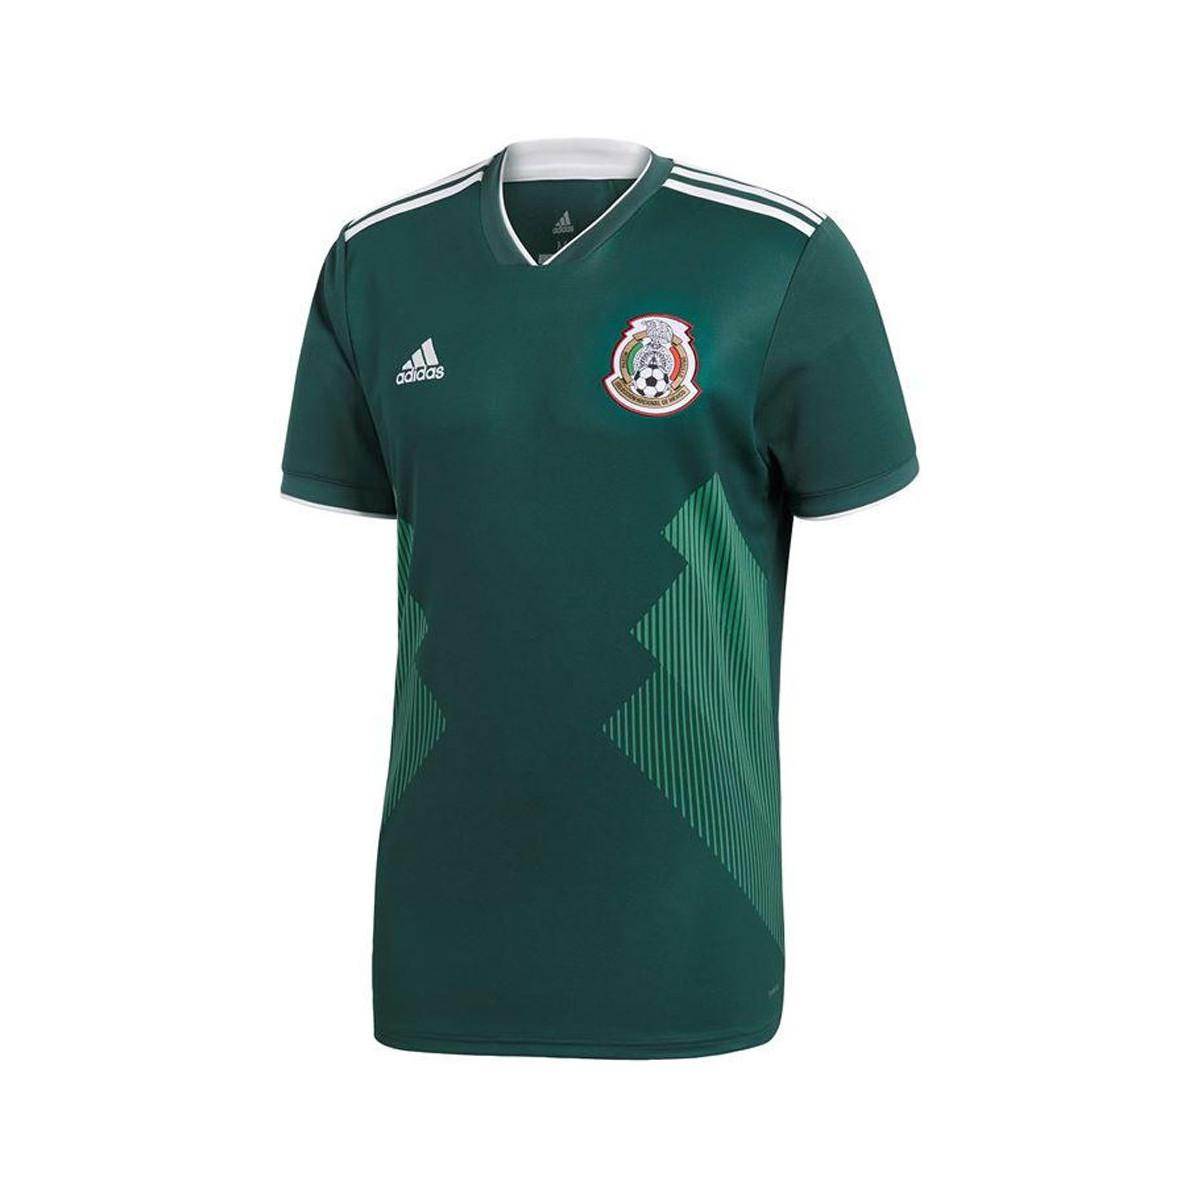 Adidas - 2018-2019 Mexico Home Football Shirt (kids) Women s T Shirt In.  View fullscreen aac638f88